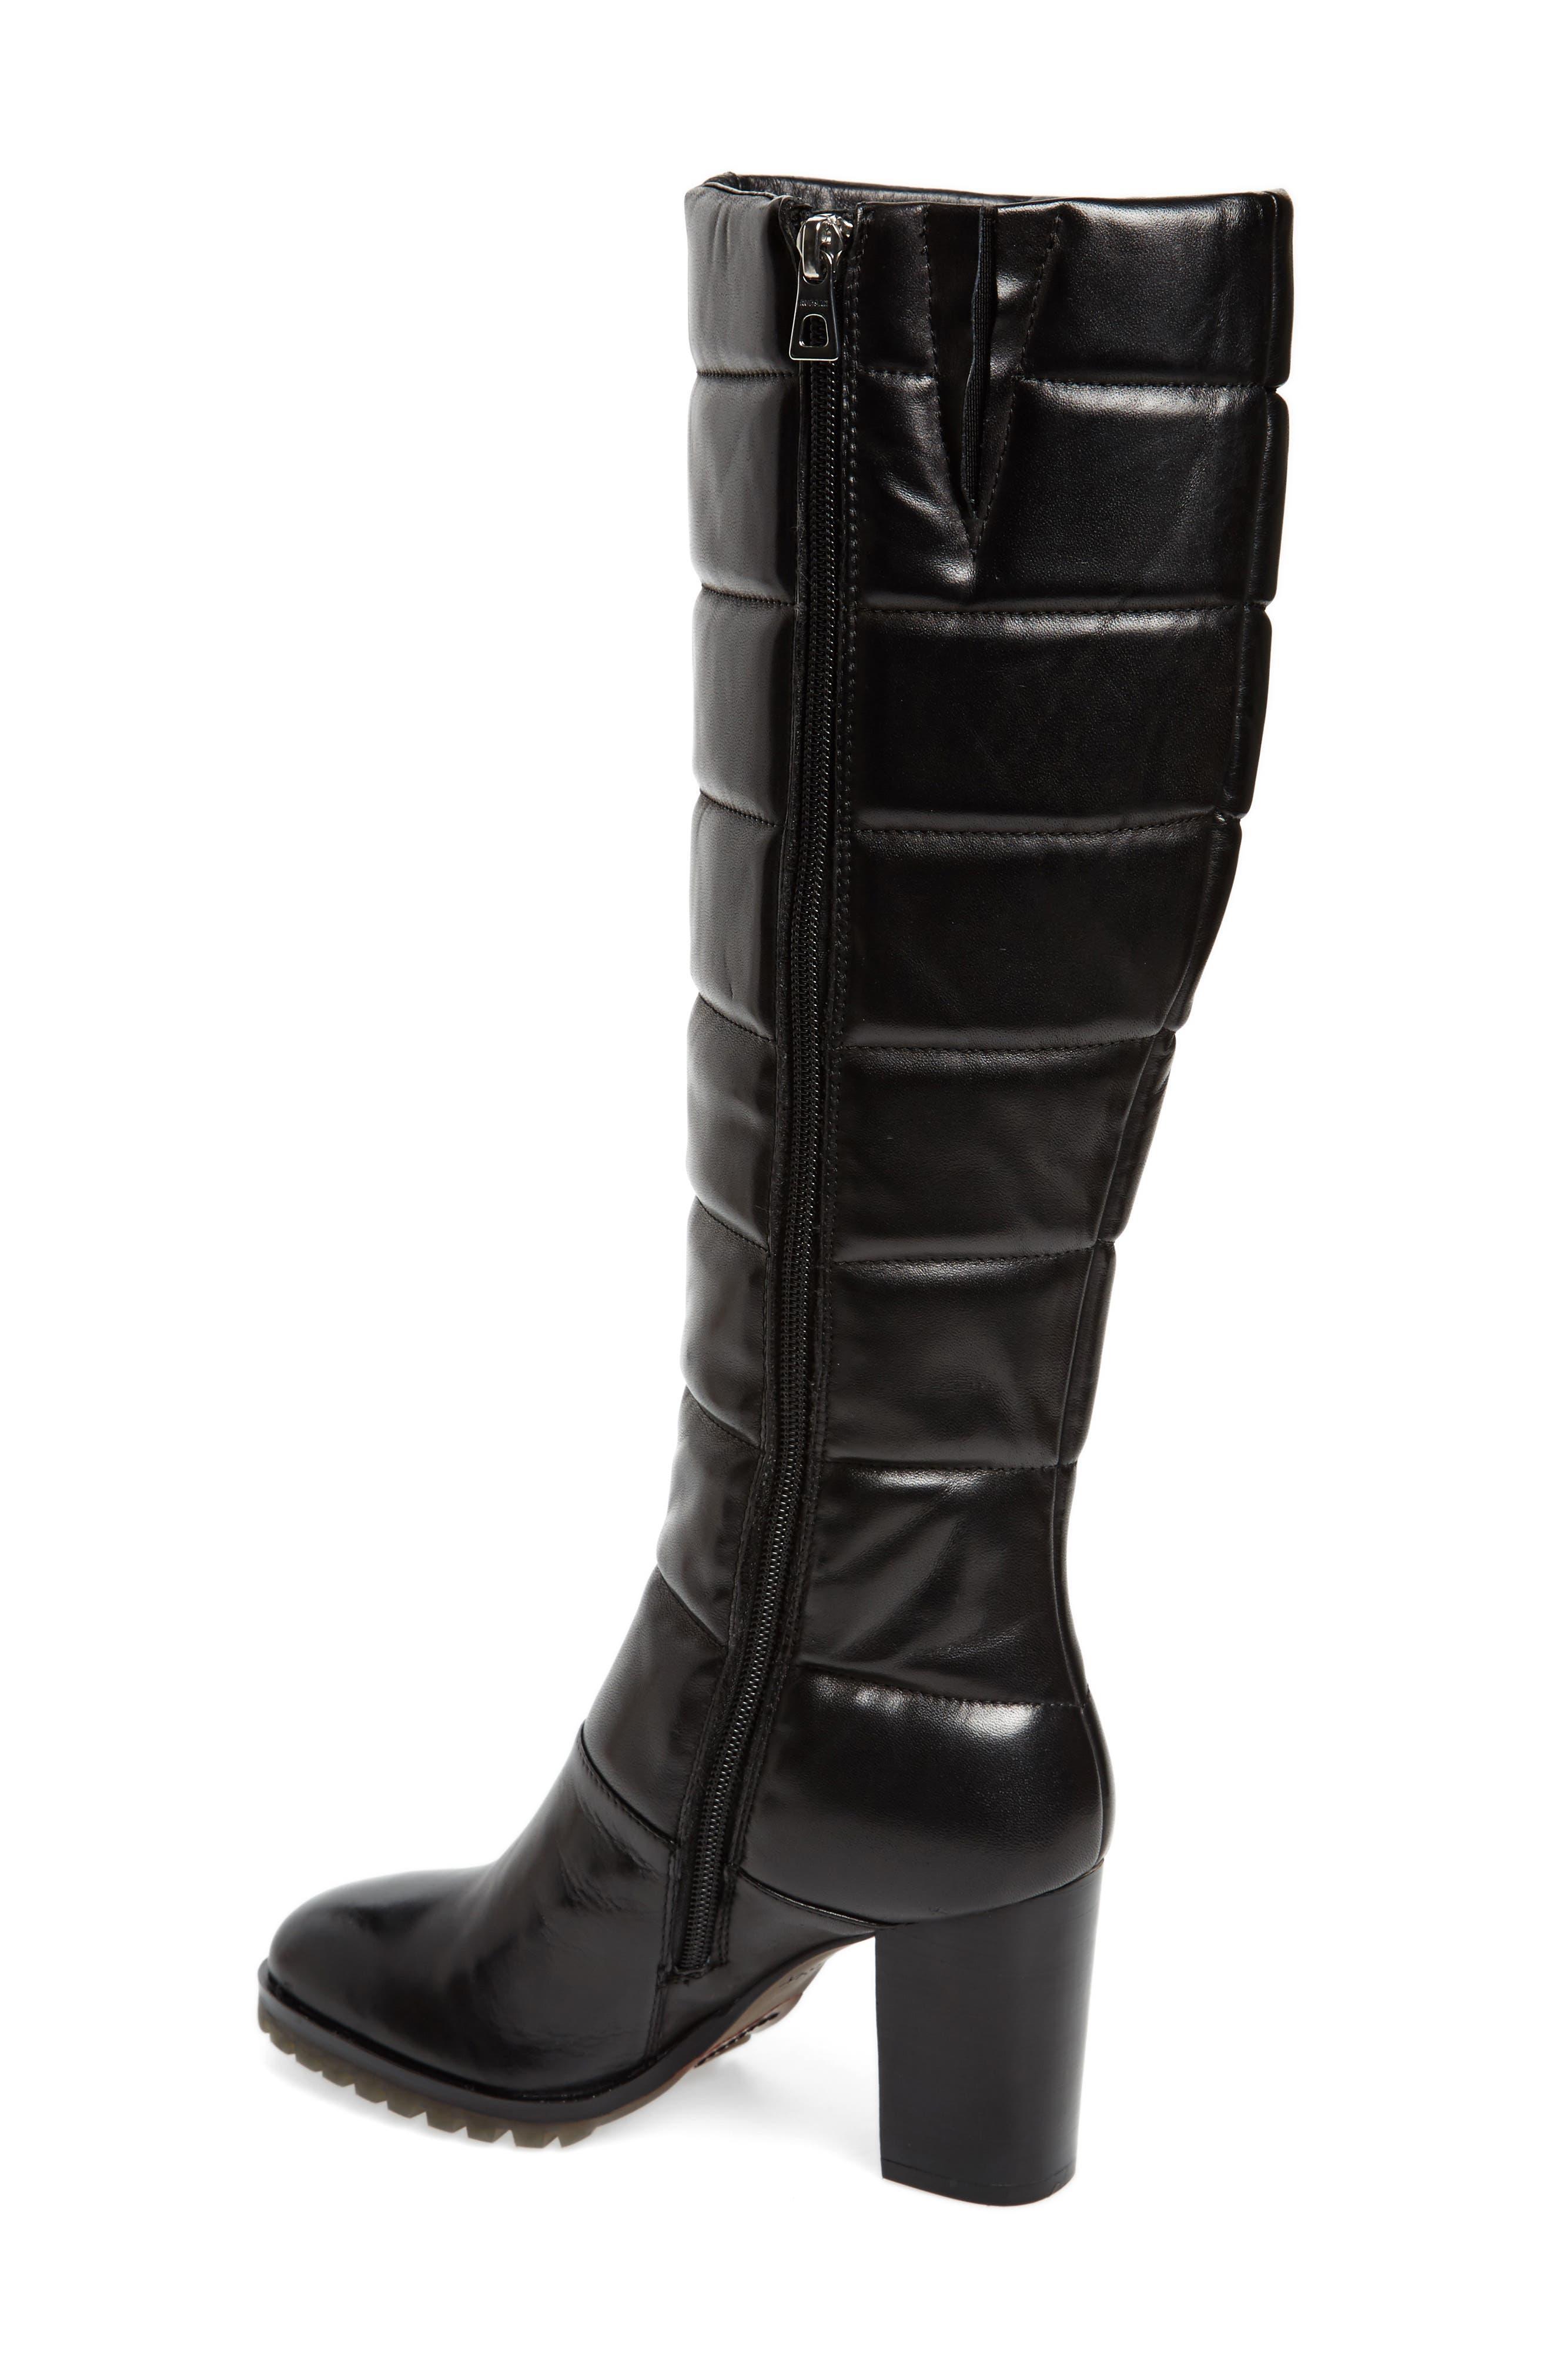 Tropia Knee High Boot,                             Alternate thumbnail 2, color,                             Black Leather